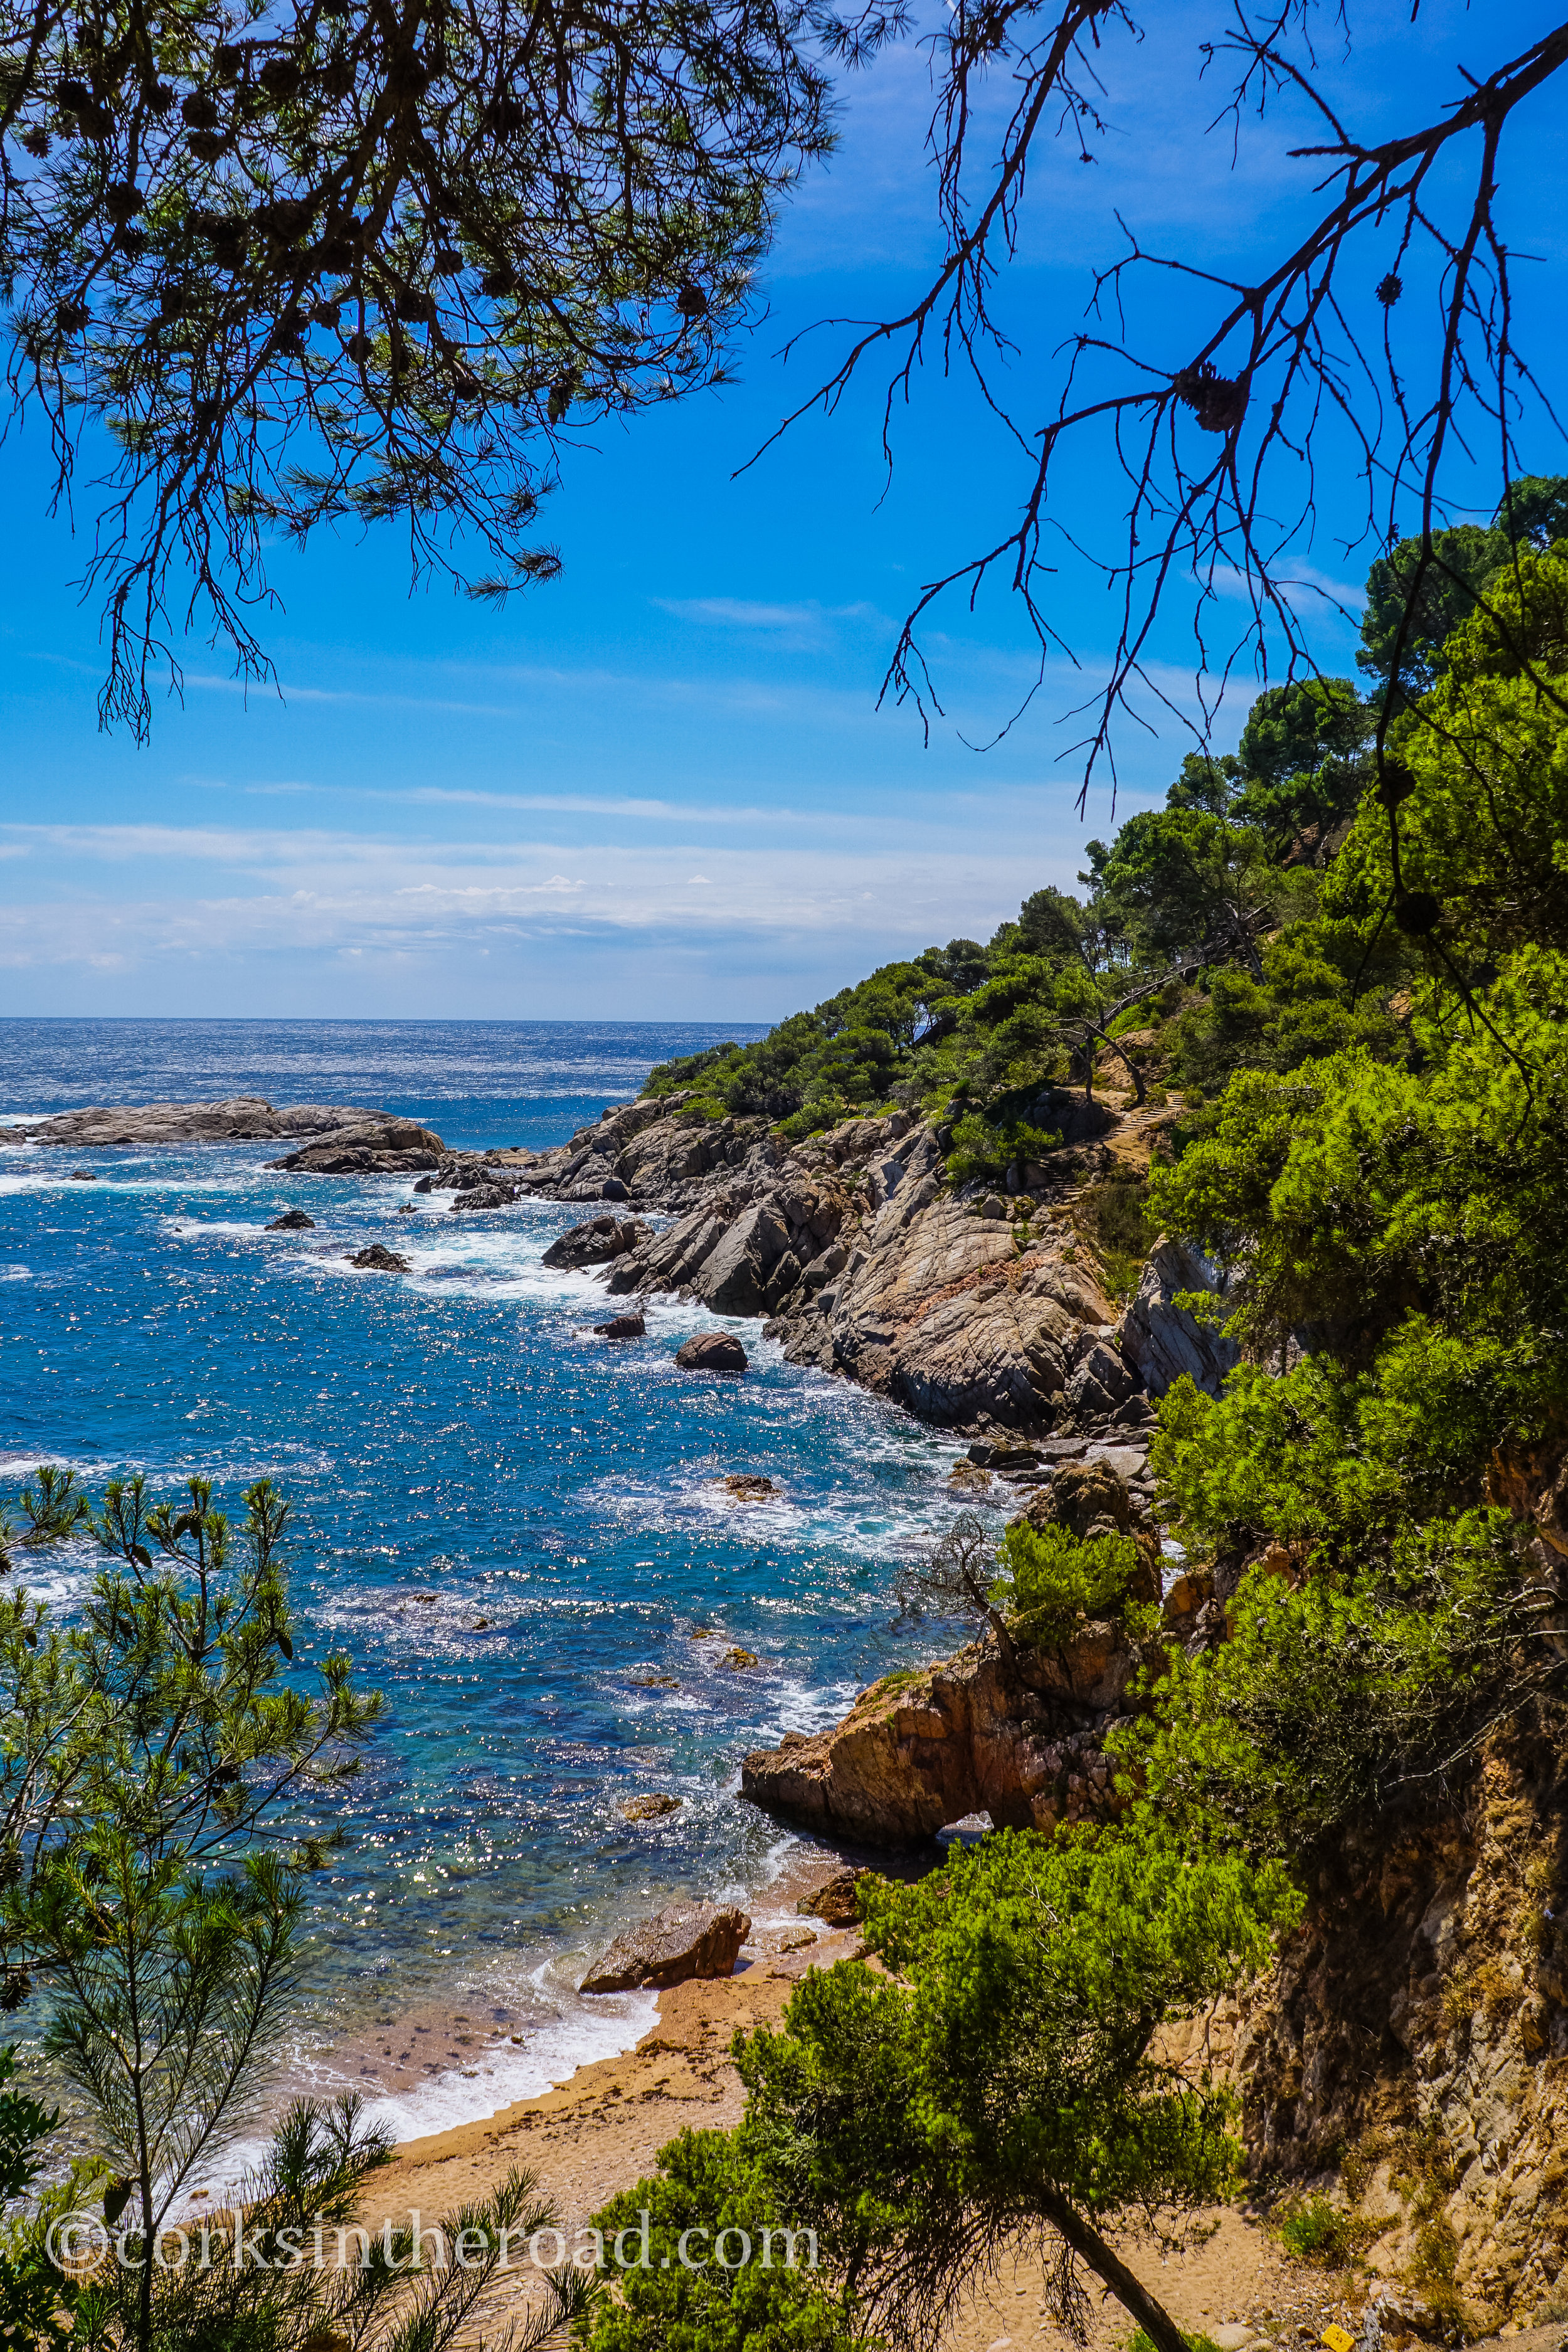 20160810Barcelona, Corksintheroad, Costa Brava, Costa Brava Landscape-31.jpg